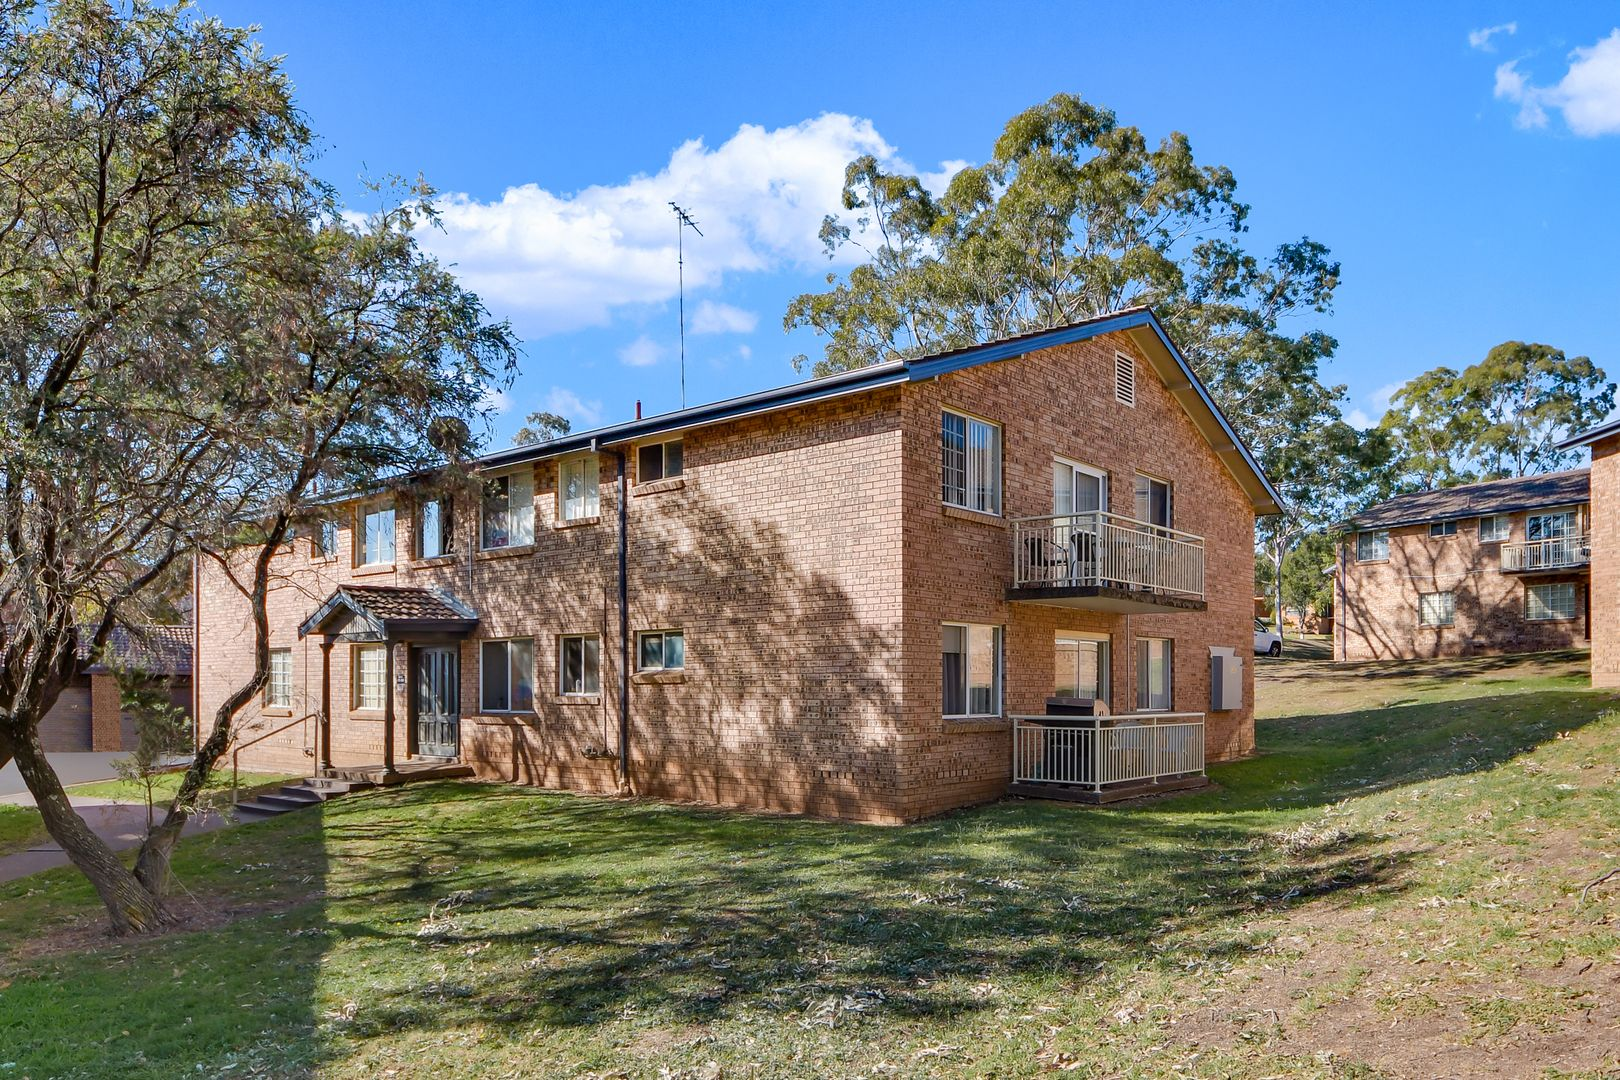 50/100 Burrinjuck Street, Leumeah NSW 2560, Image 0